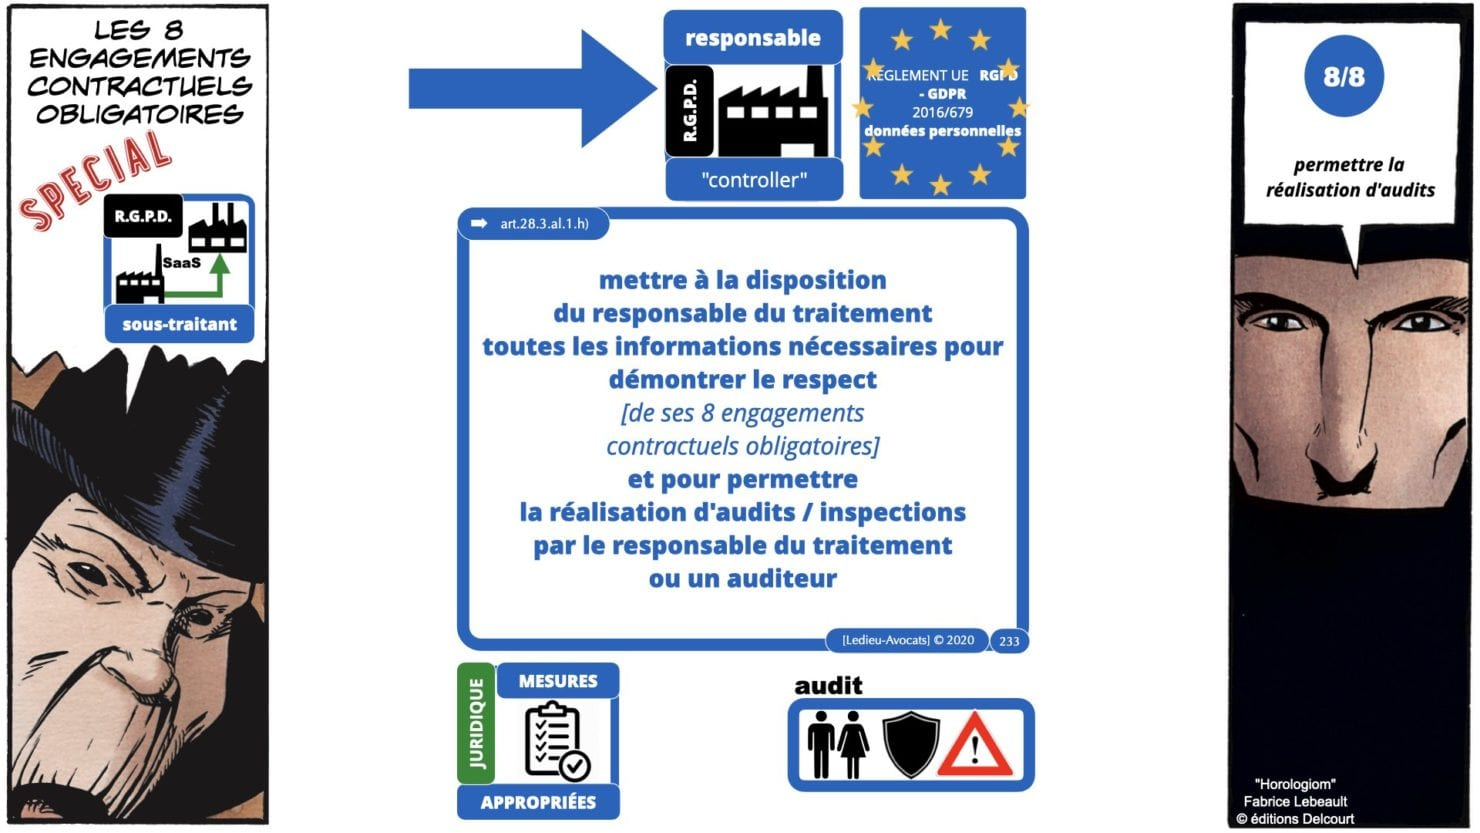 RGPD e-Privacy principes actualité jurisprudence ©Ledieu-Avocats 25-06-2021.233